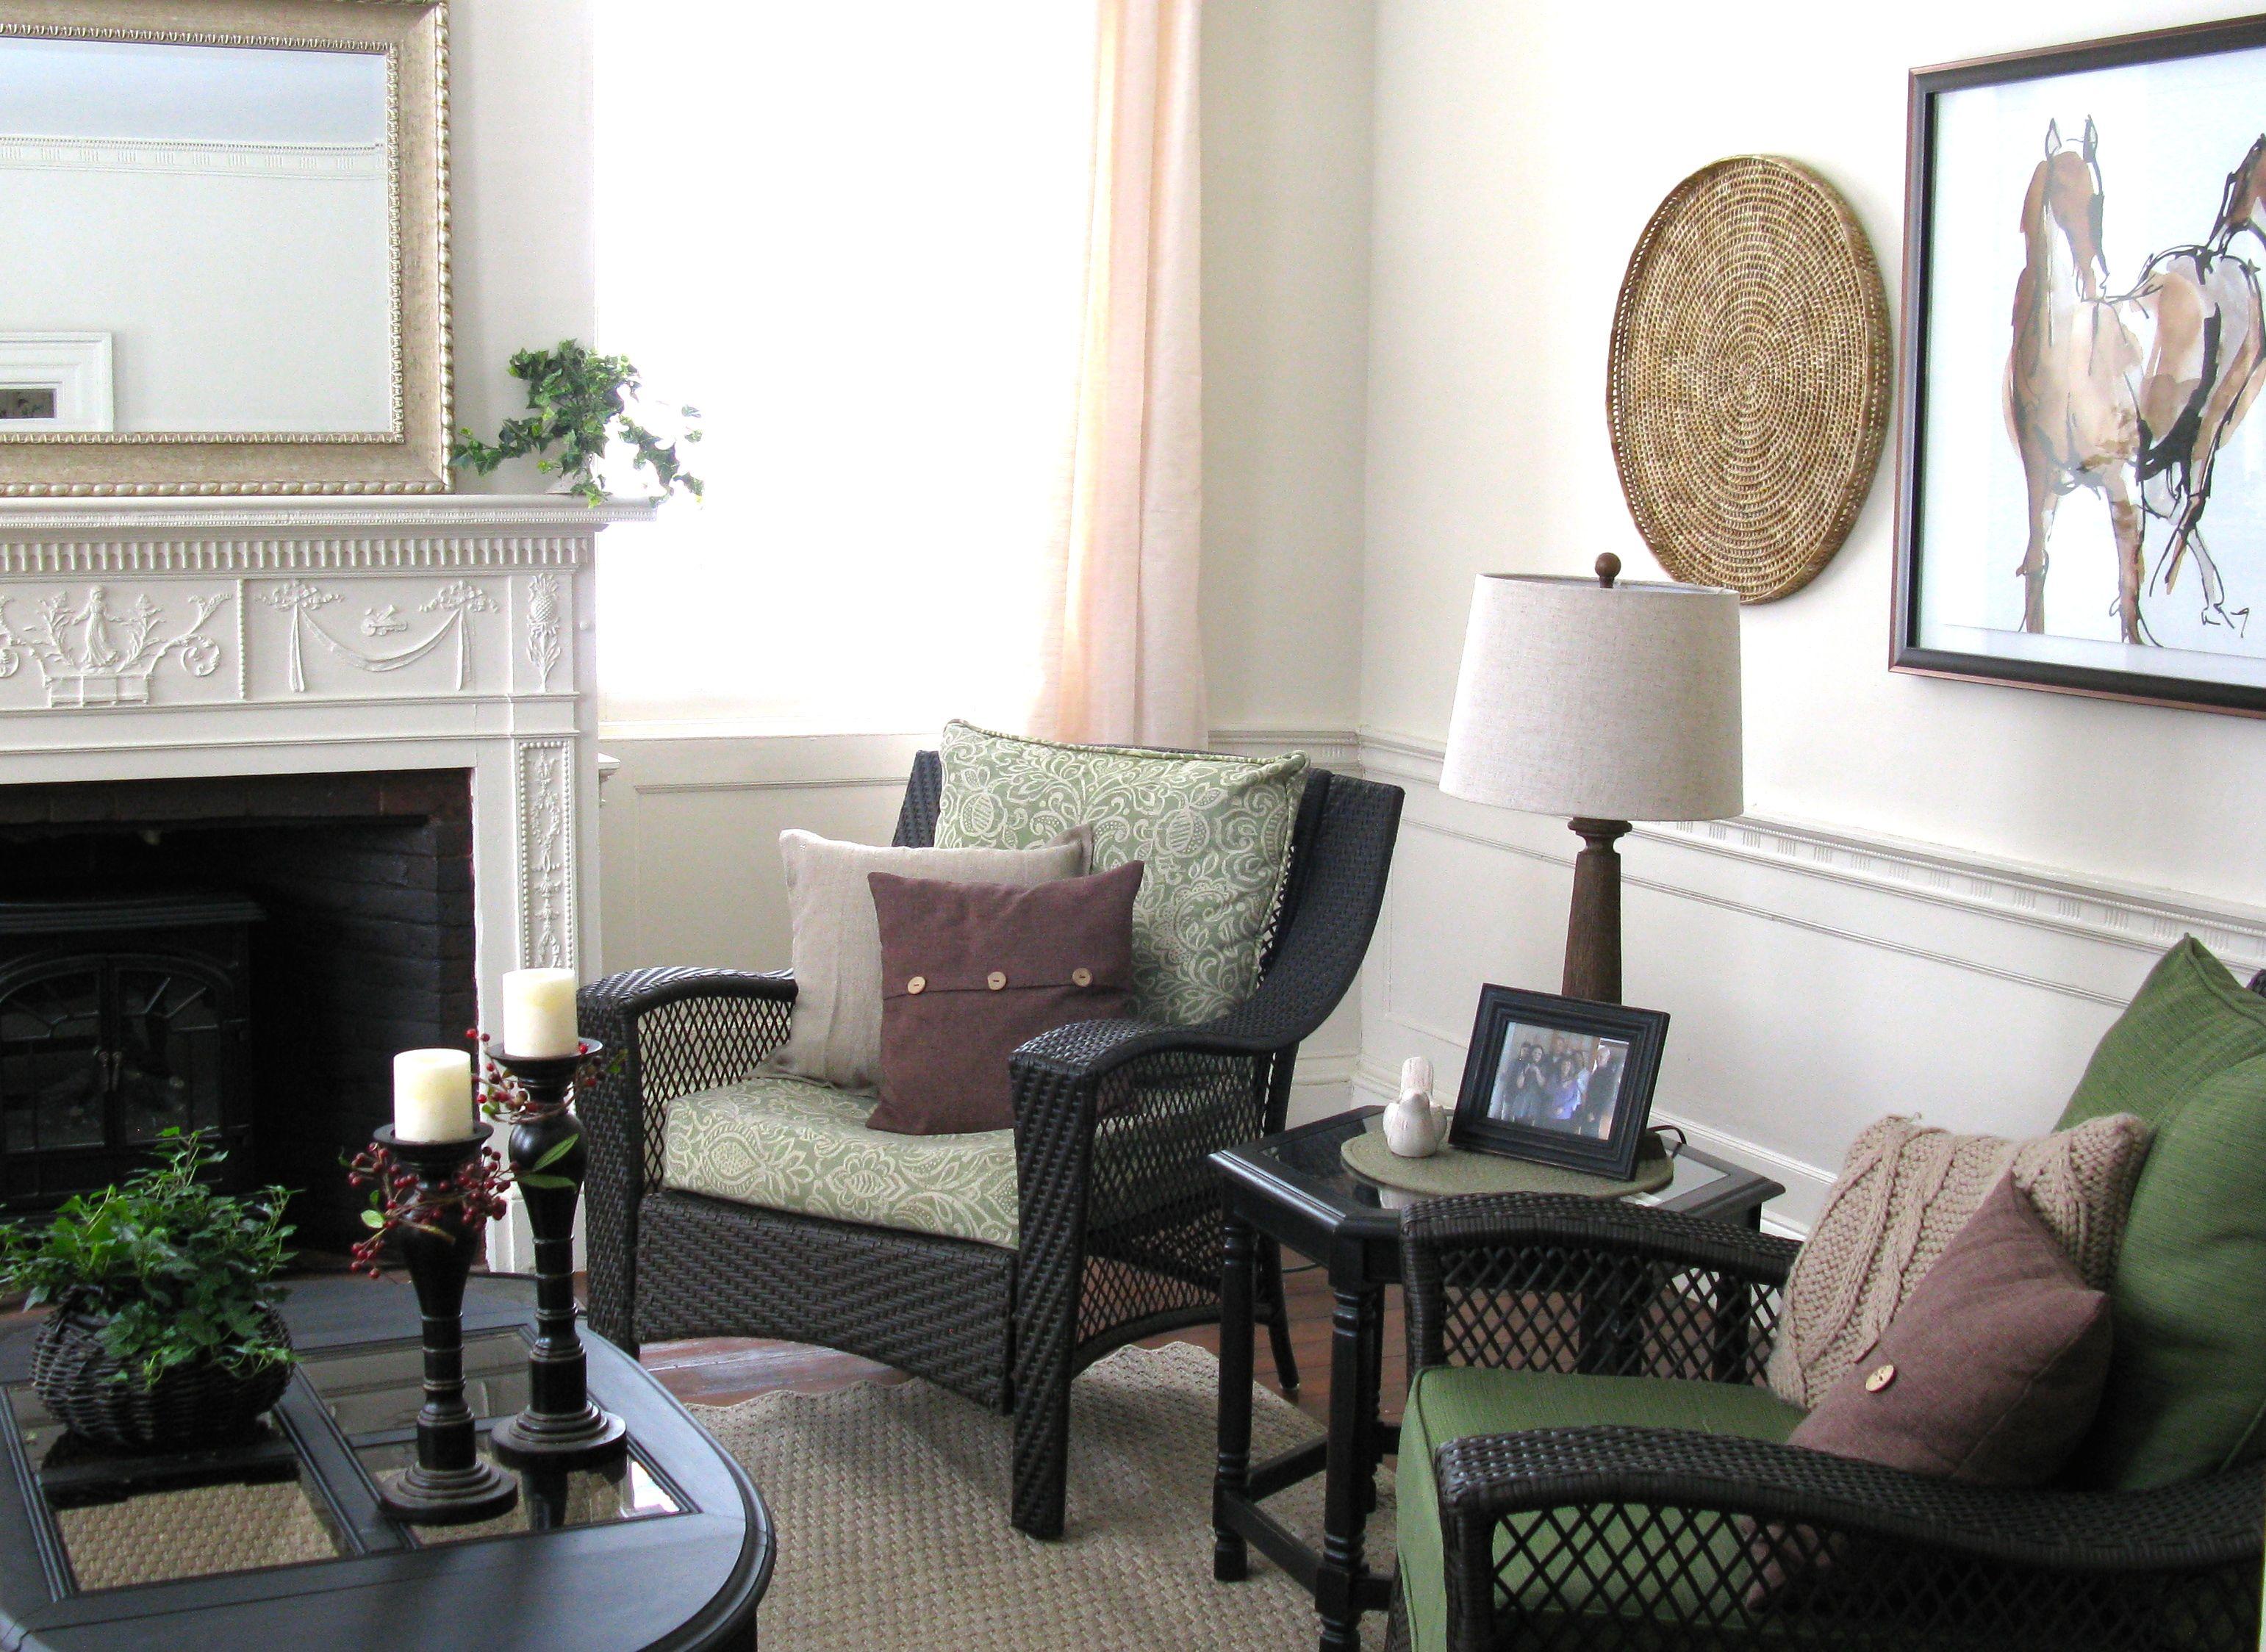 sitting room fireplace wicker furniture green brown black